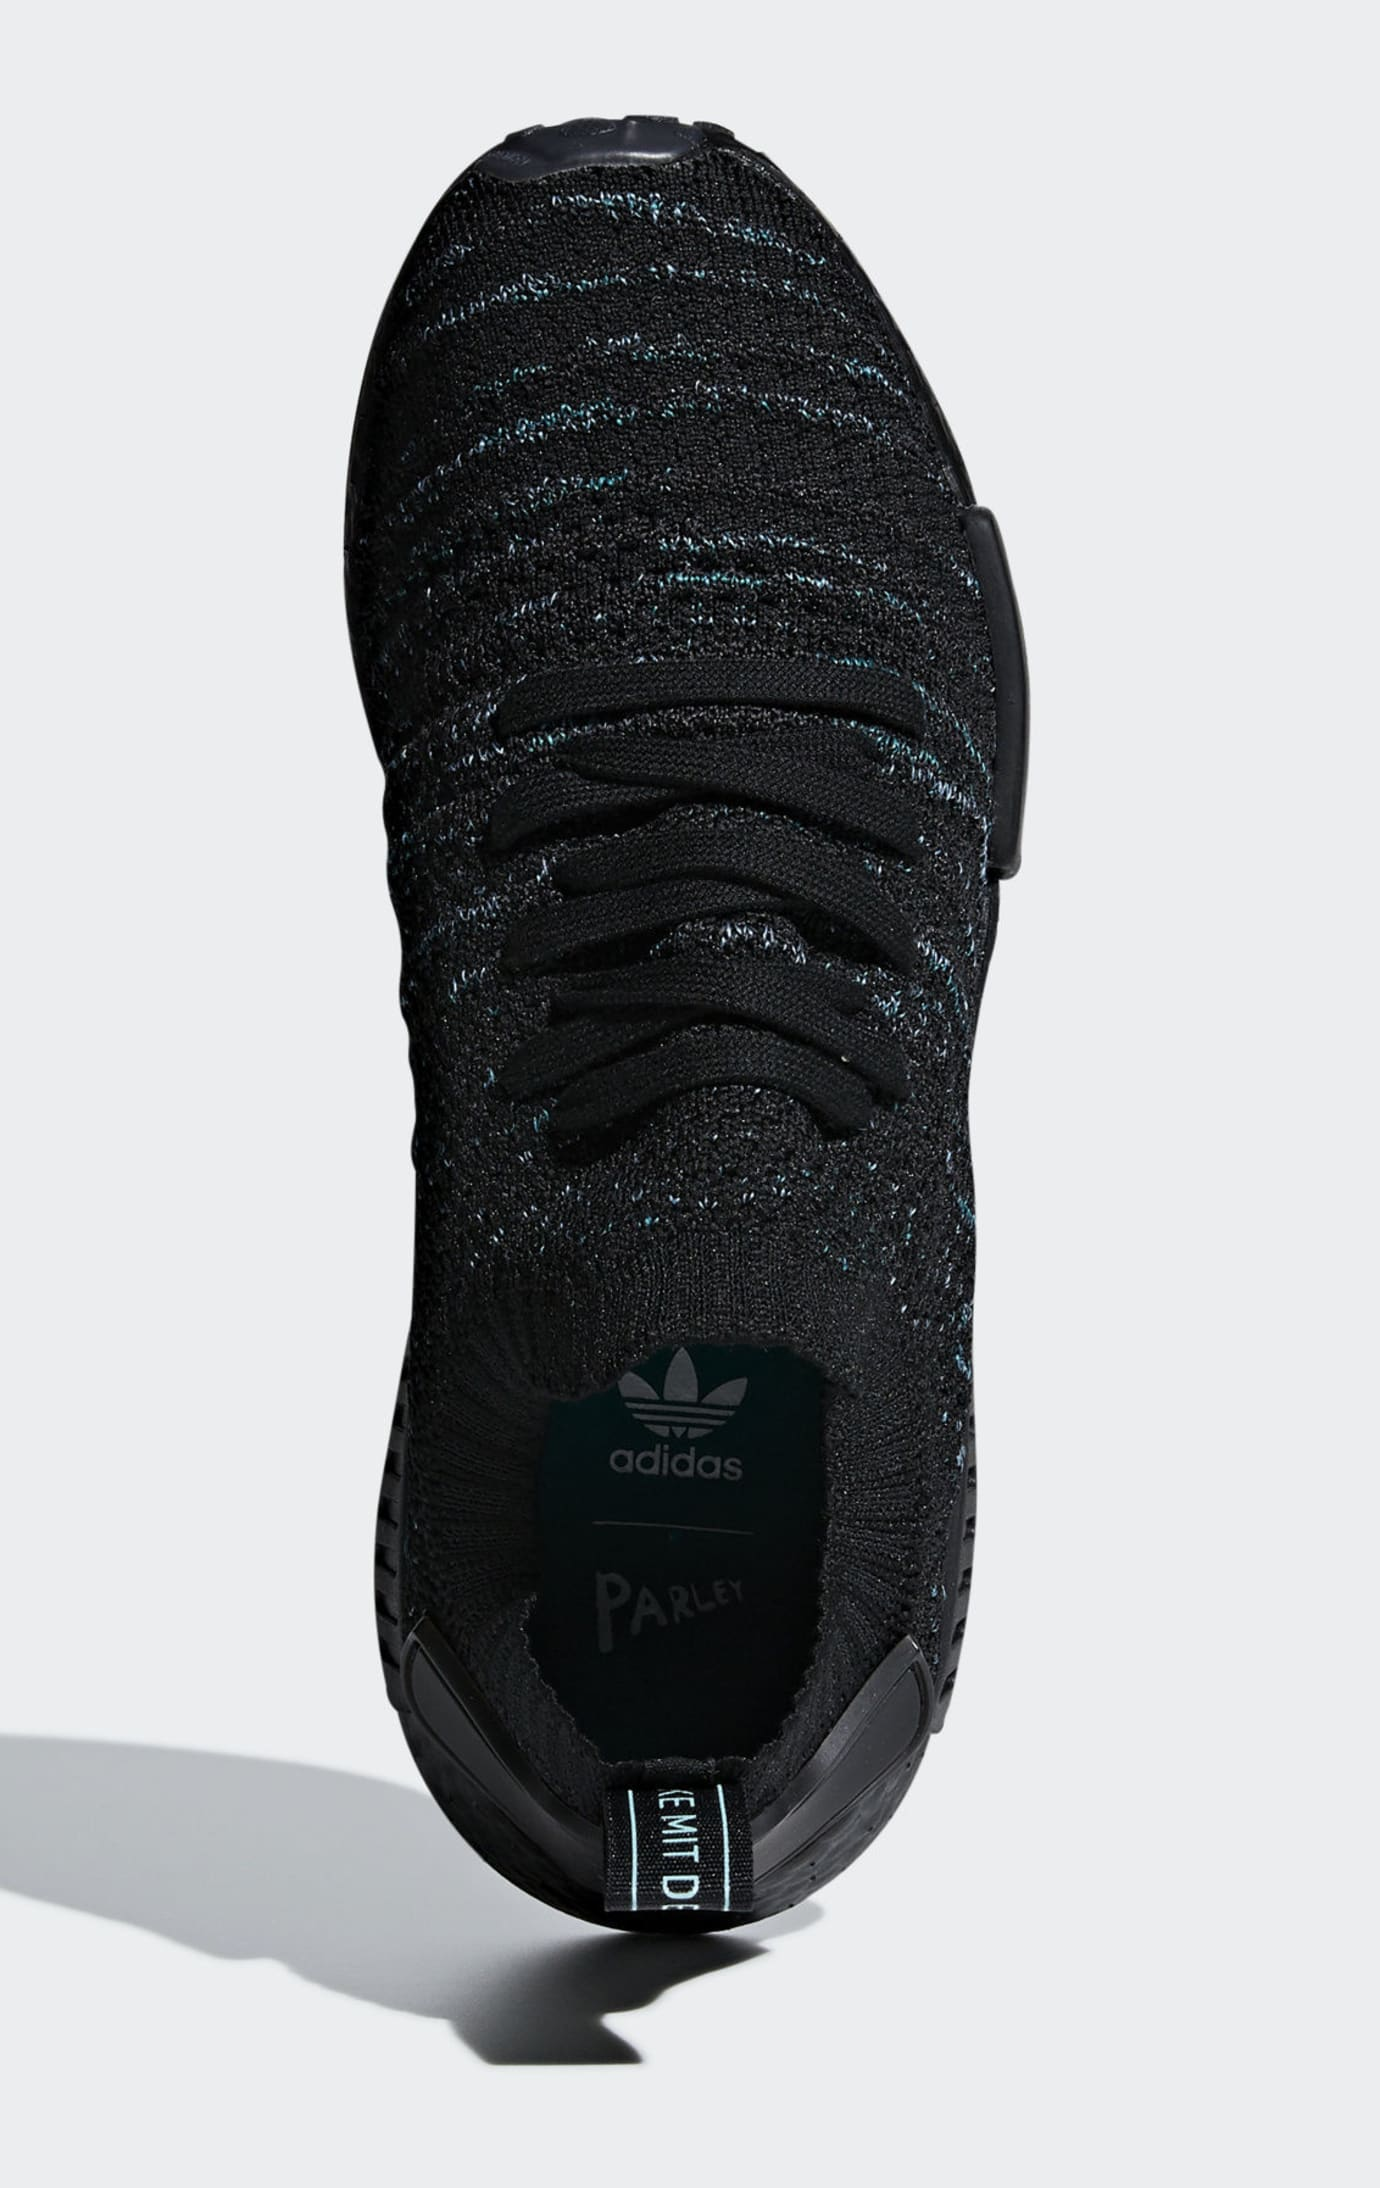 d0d995c8f1e58 Image via Adidas parley-adidas-nmd-r1-core-black-blue-spirit-